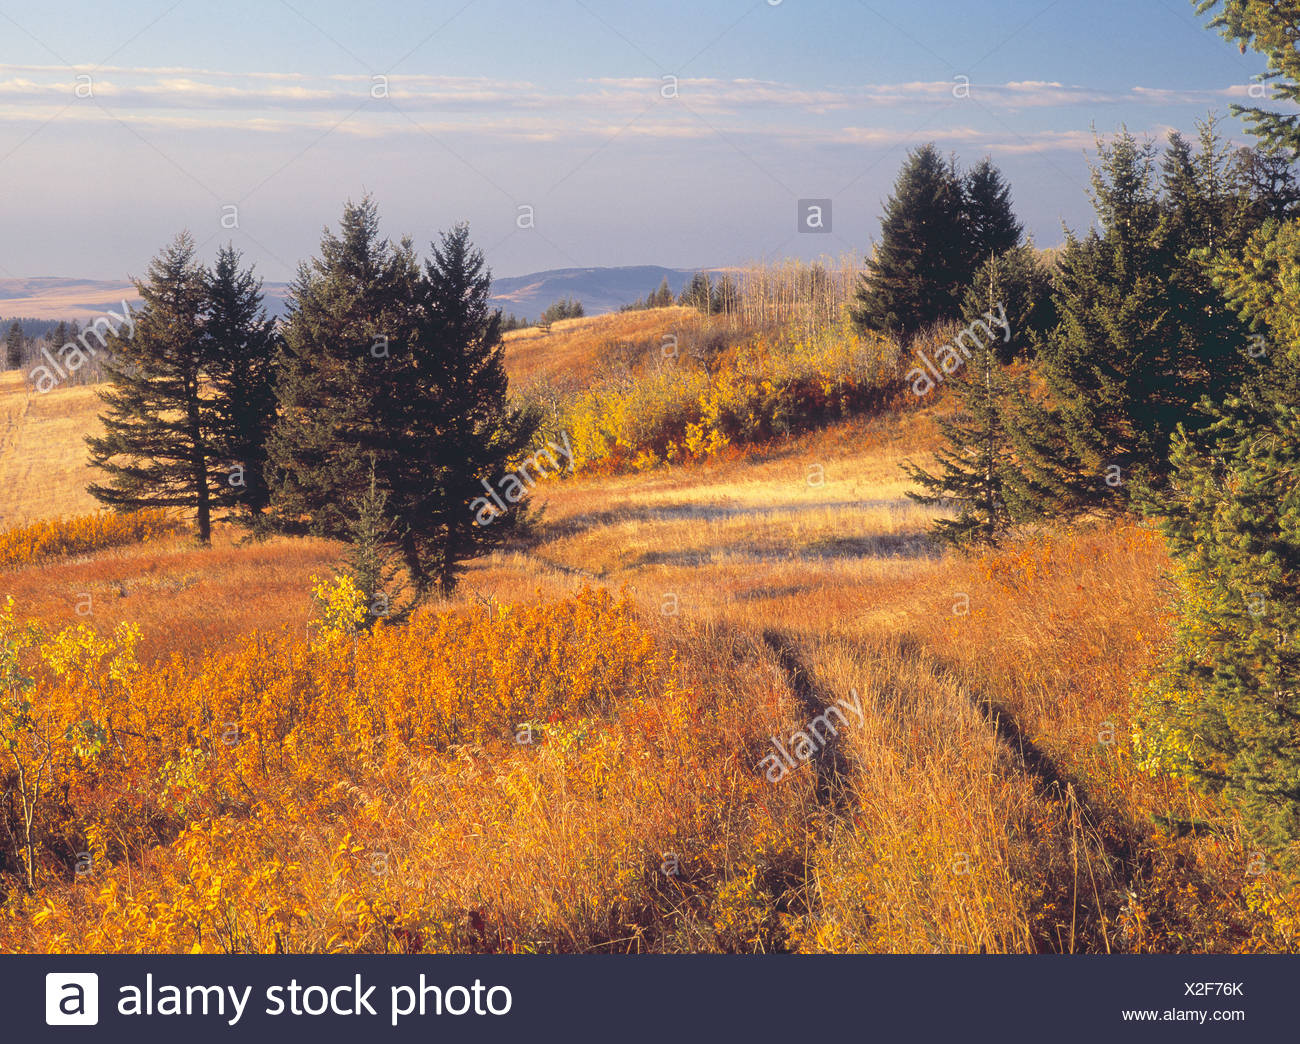 Fall colours and rangeland, Porcupine Hills, Alberta, Canada. Stock Photo